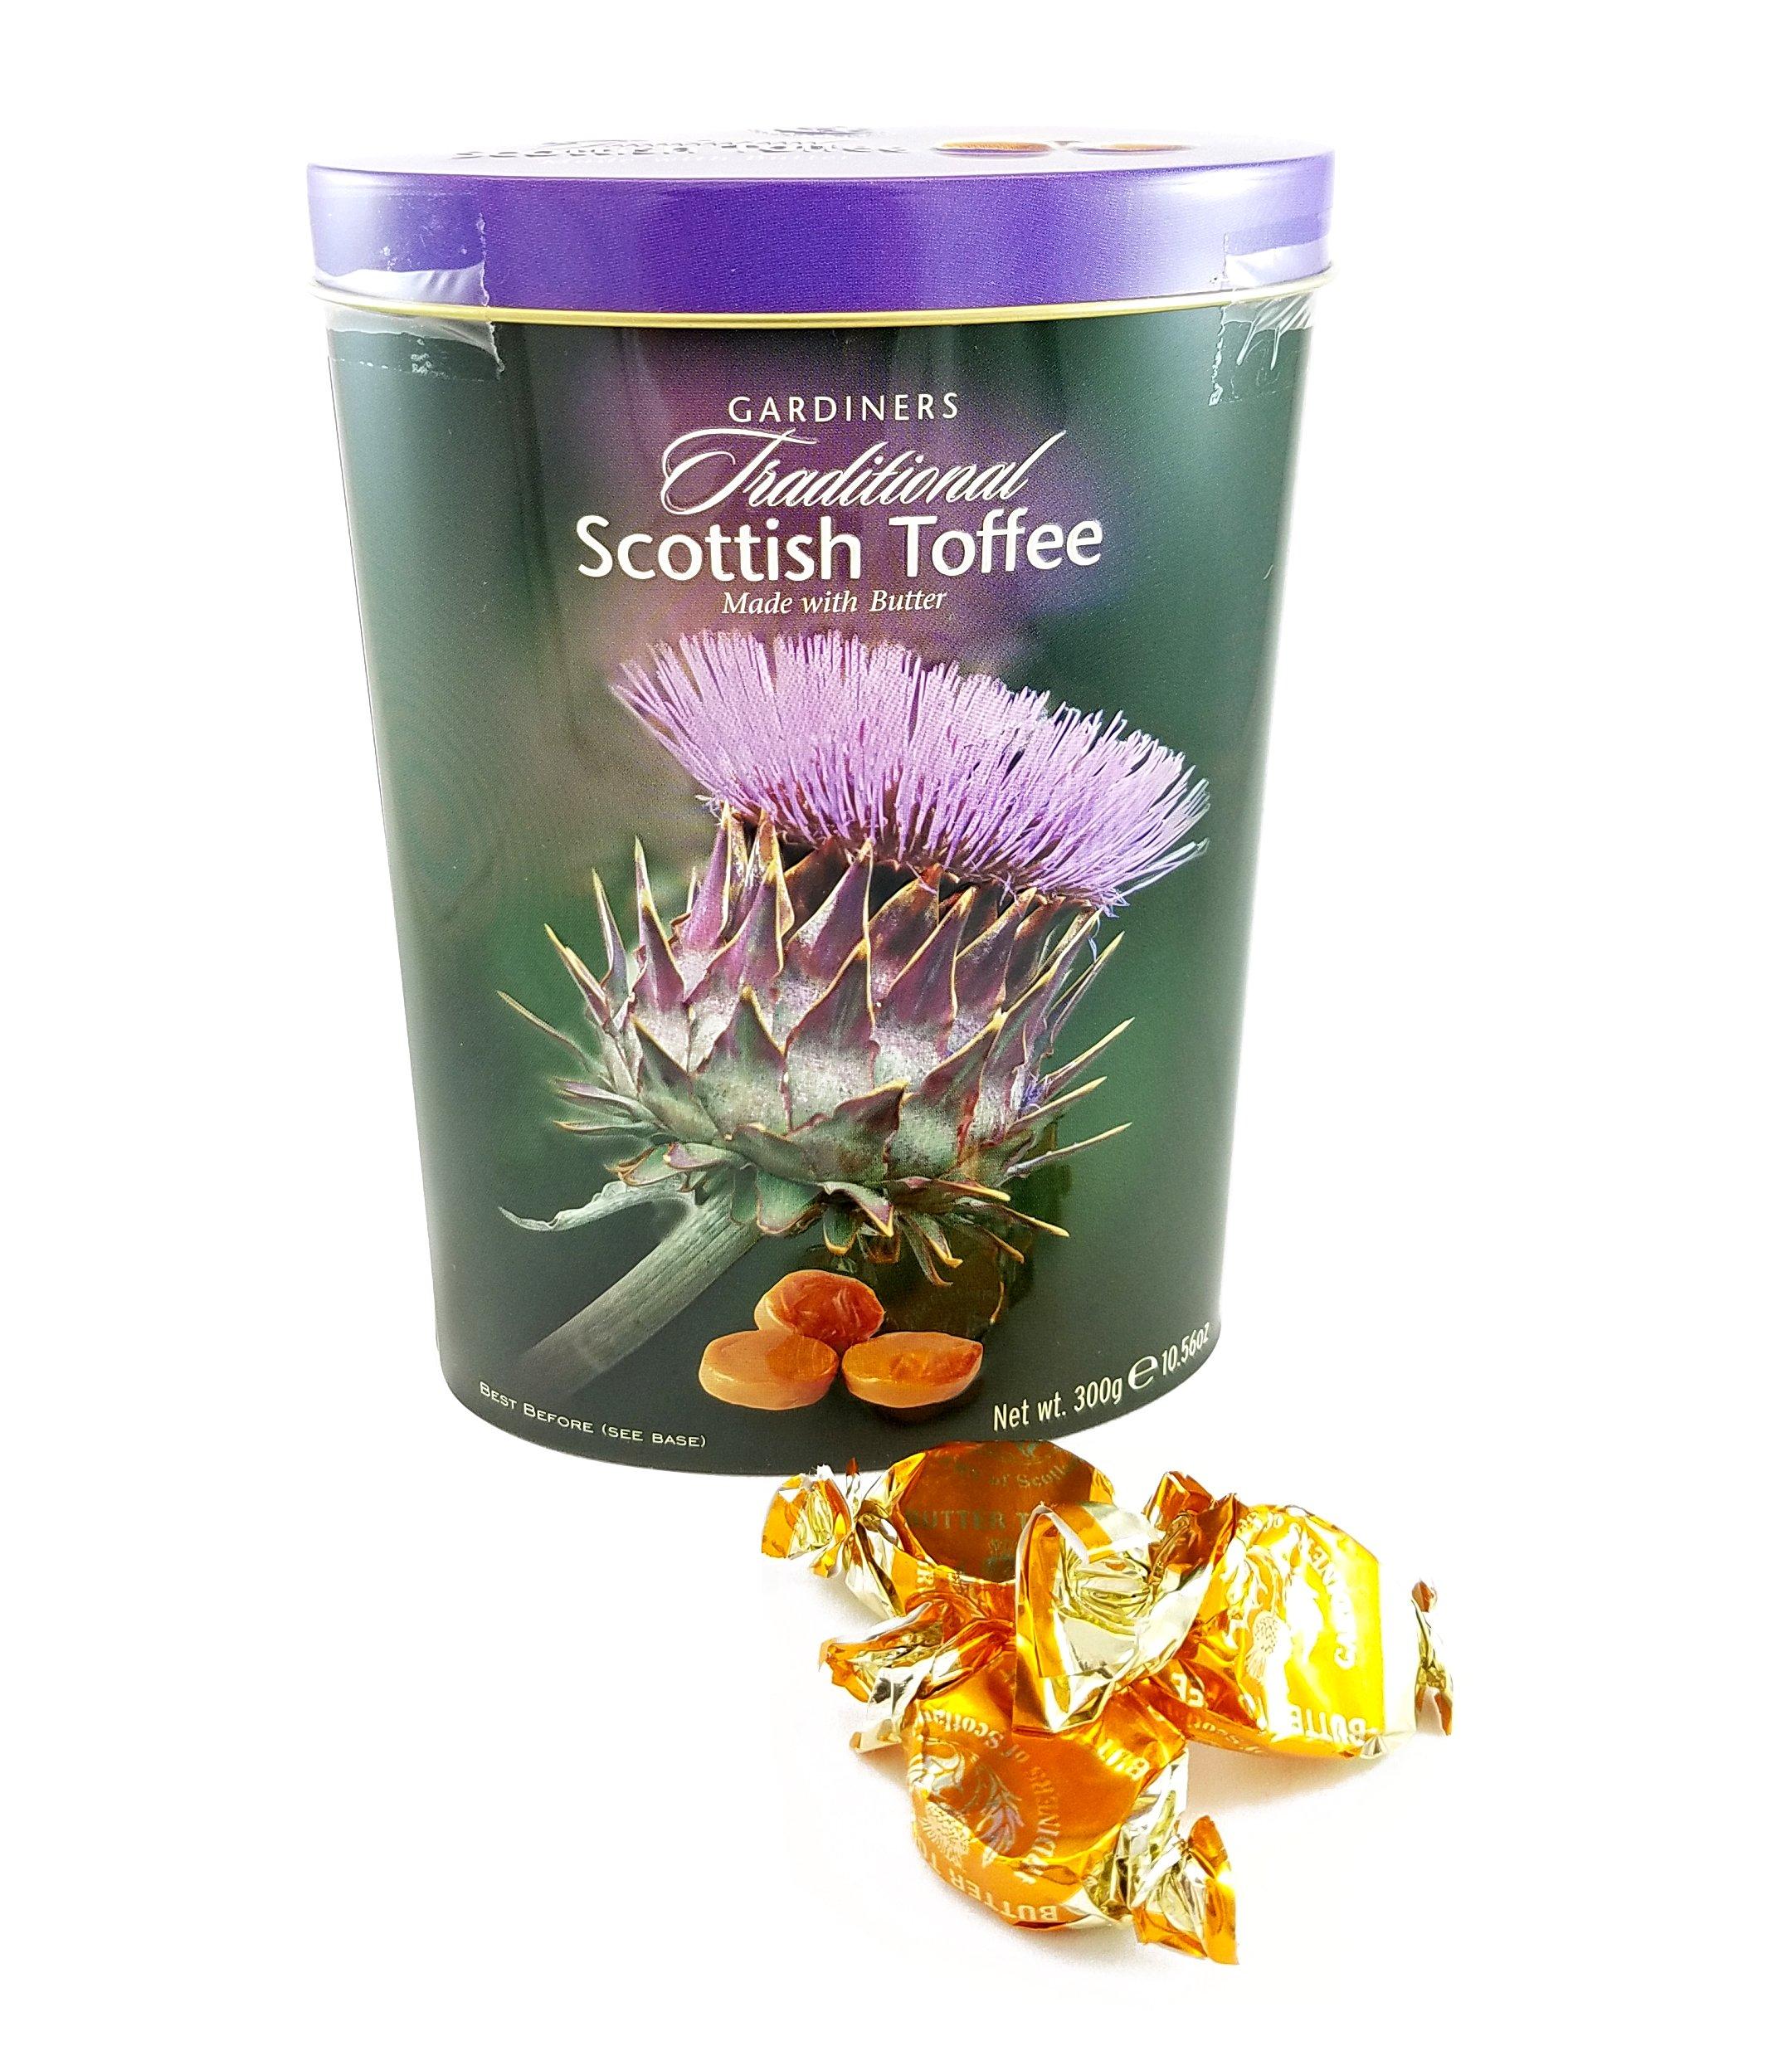 Amazon.com: Gardiners of Scotland: Flavored Fudge and Toffee ...